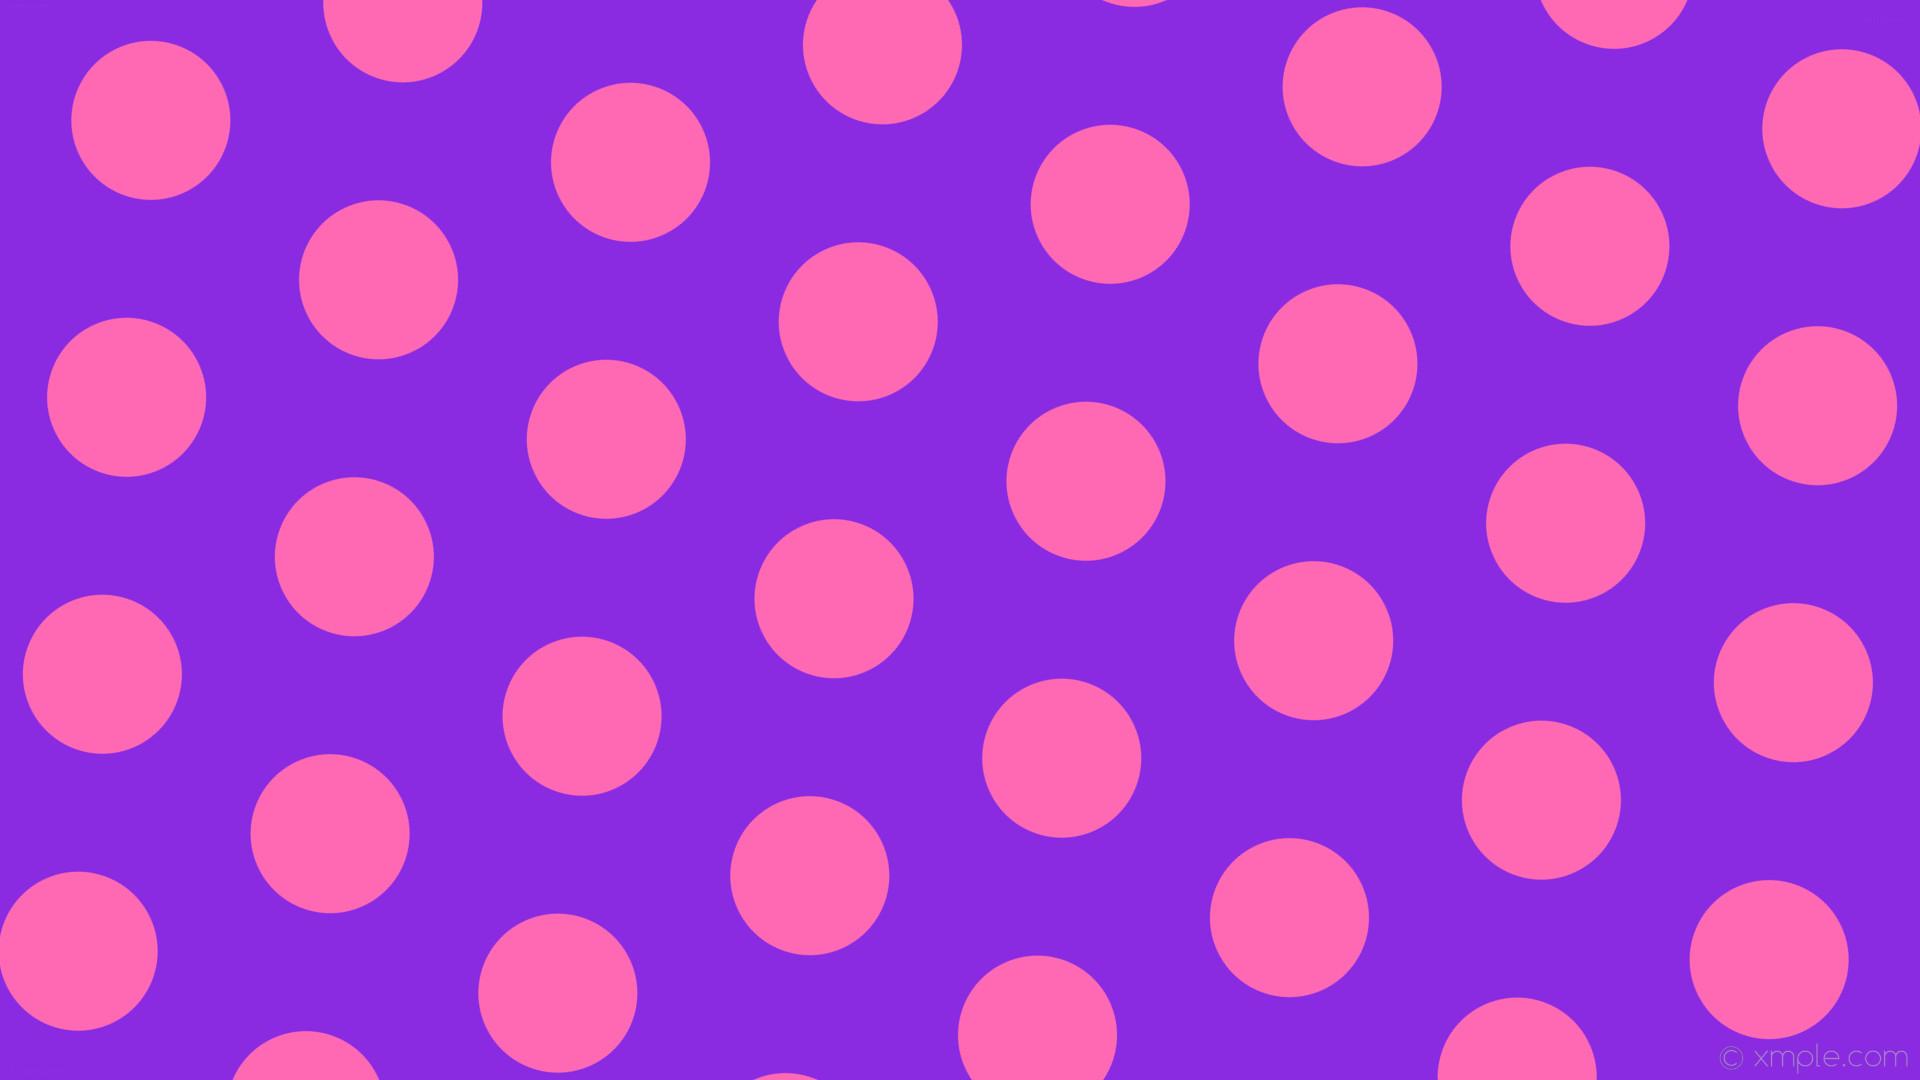 wallpaper hexagon polka pink purple dots blue violet hot pink #8a2be2  #ff69b4 diagonal 25